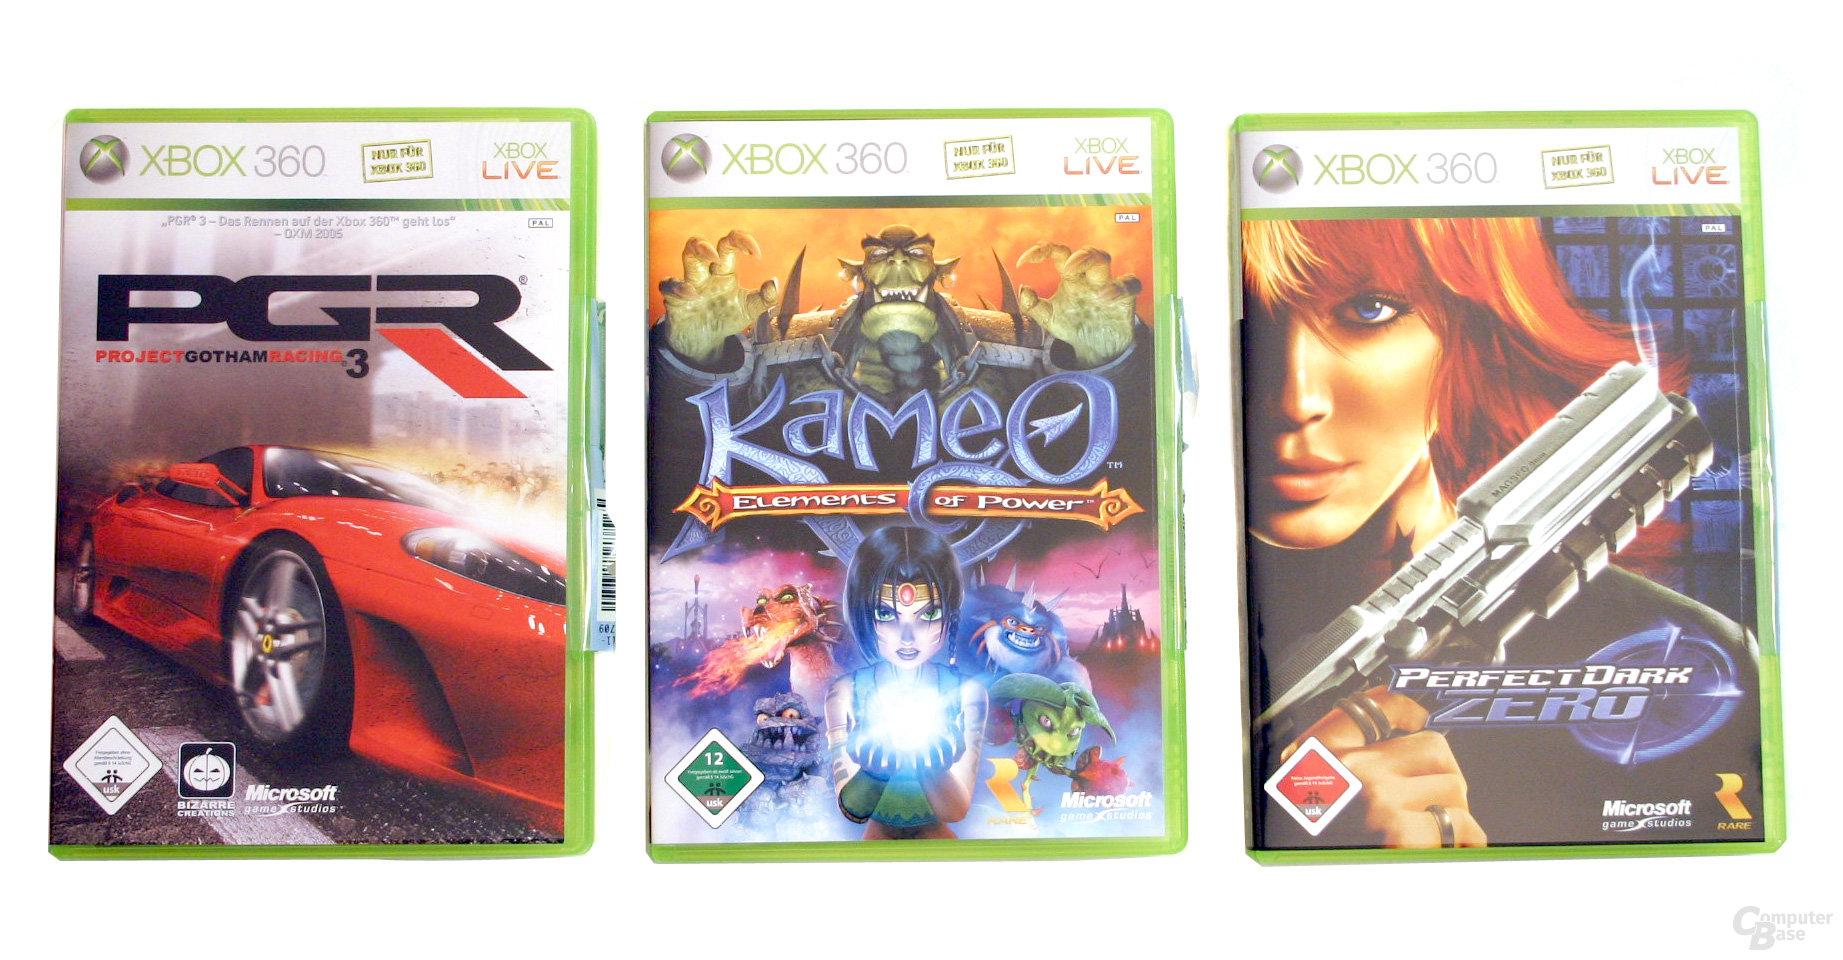 Xbox 360 - Kameo: Elements of Power, Project Gotham Racing 3 und Perfect Dark Zero